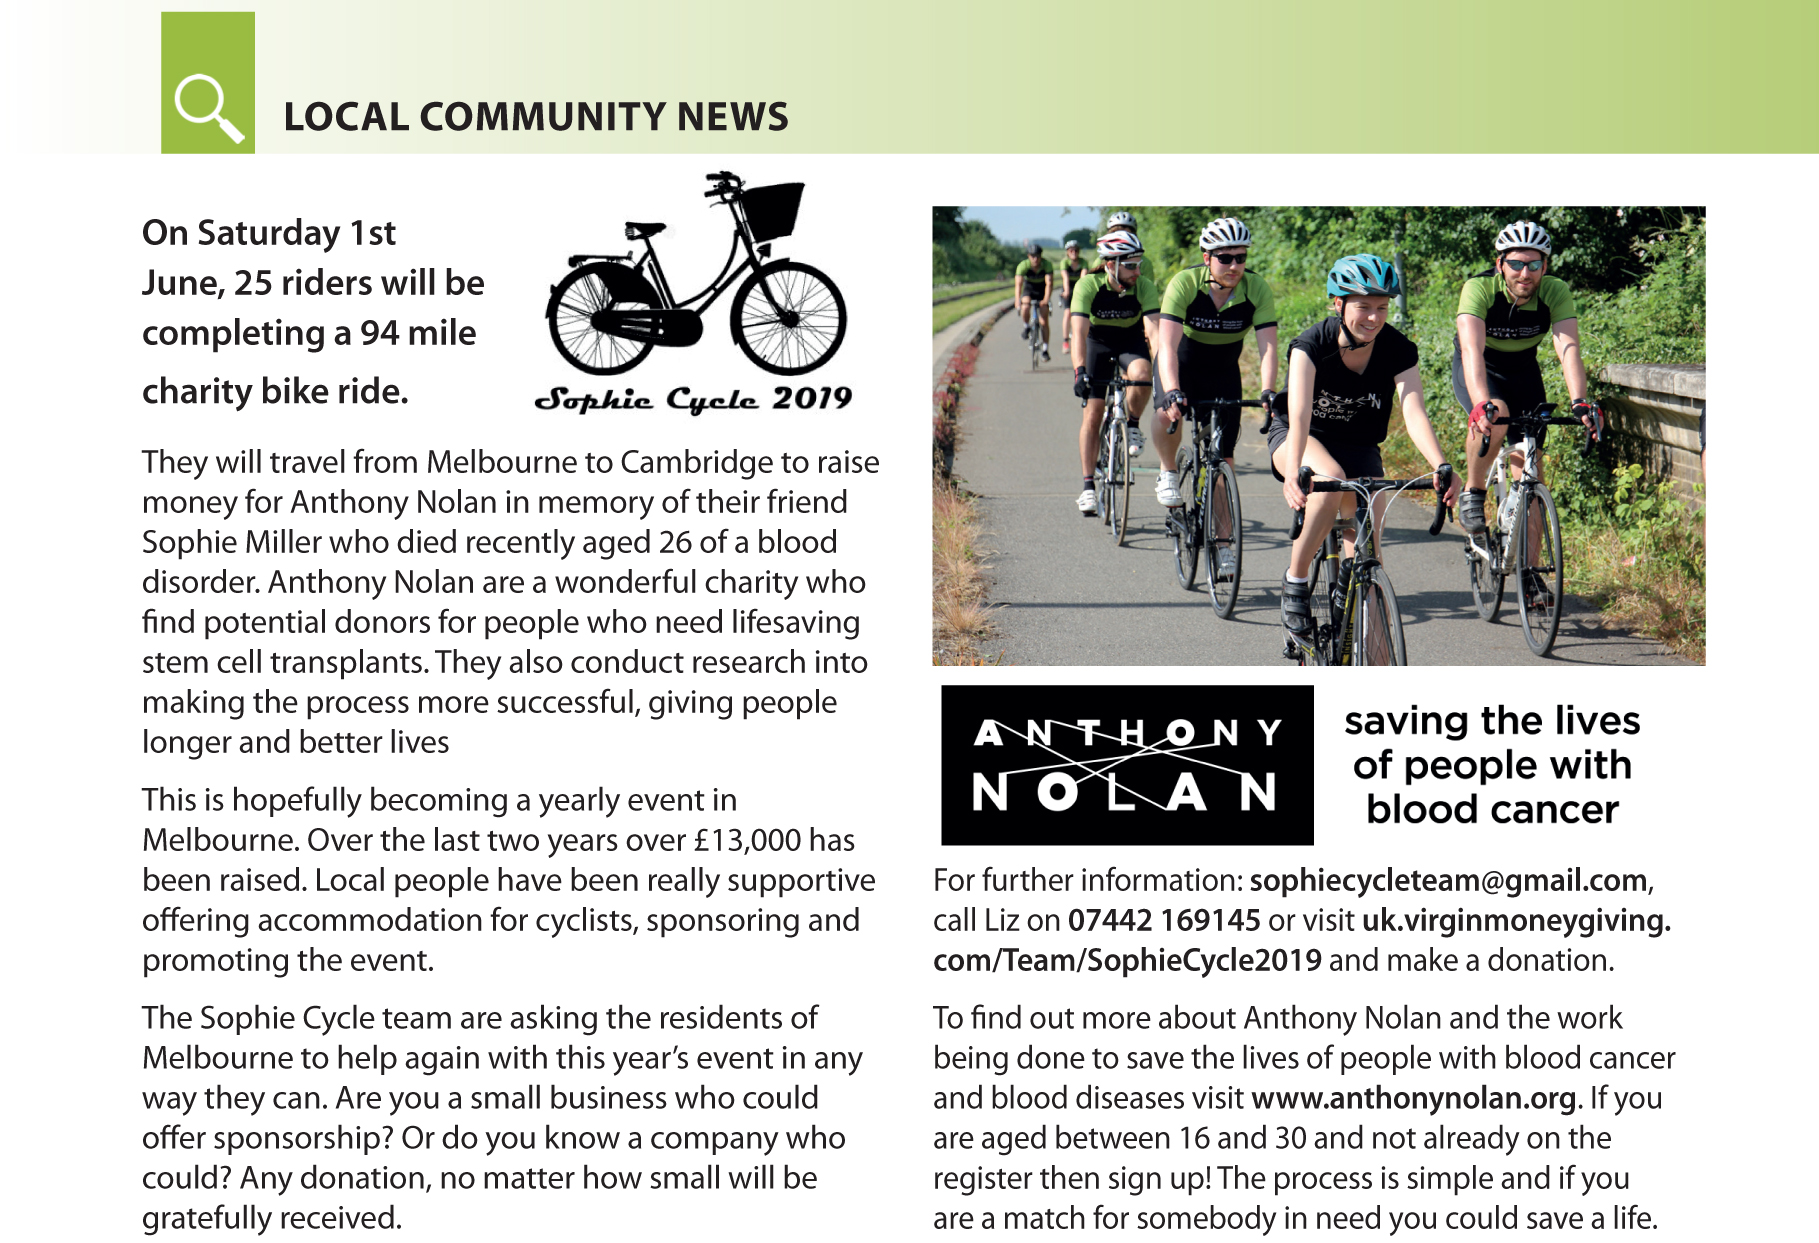 Melbourne Community News. Charity Bike ride